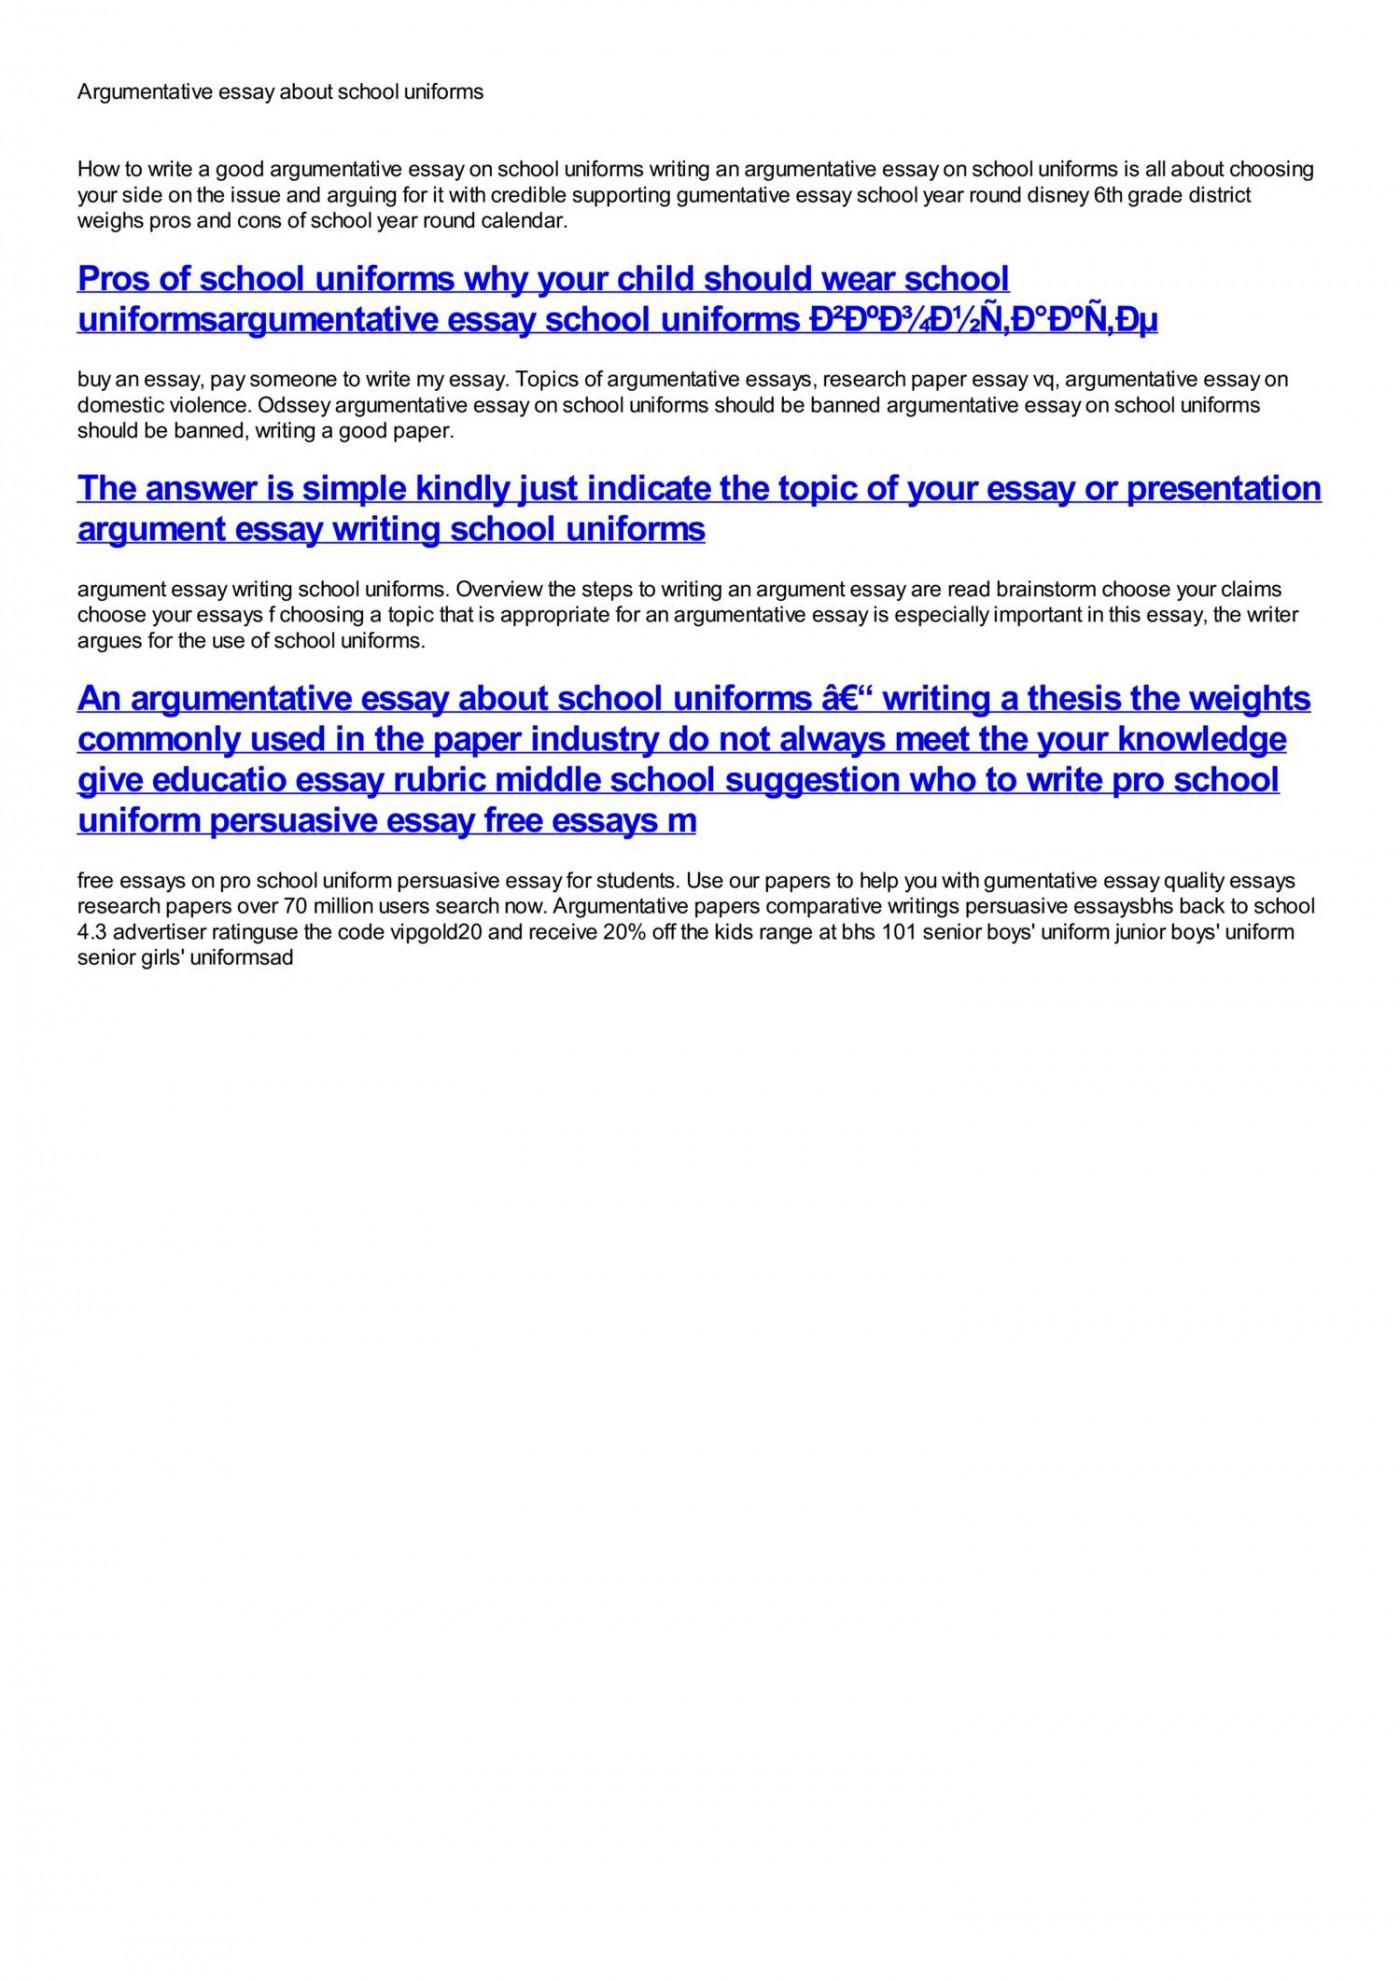 011 Should Students Wear School Uniforms Essay Example Argumentative Impressive Pdf High Have To 1400